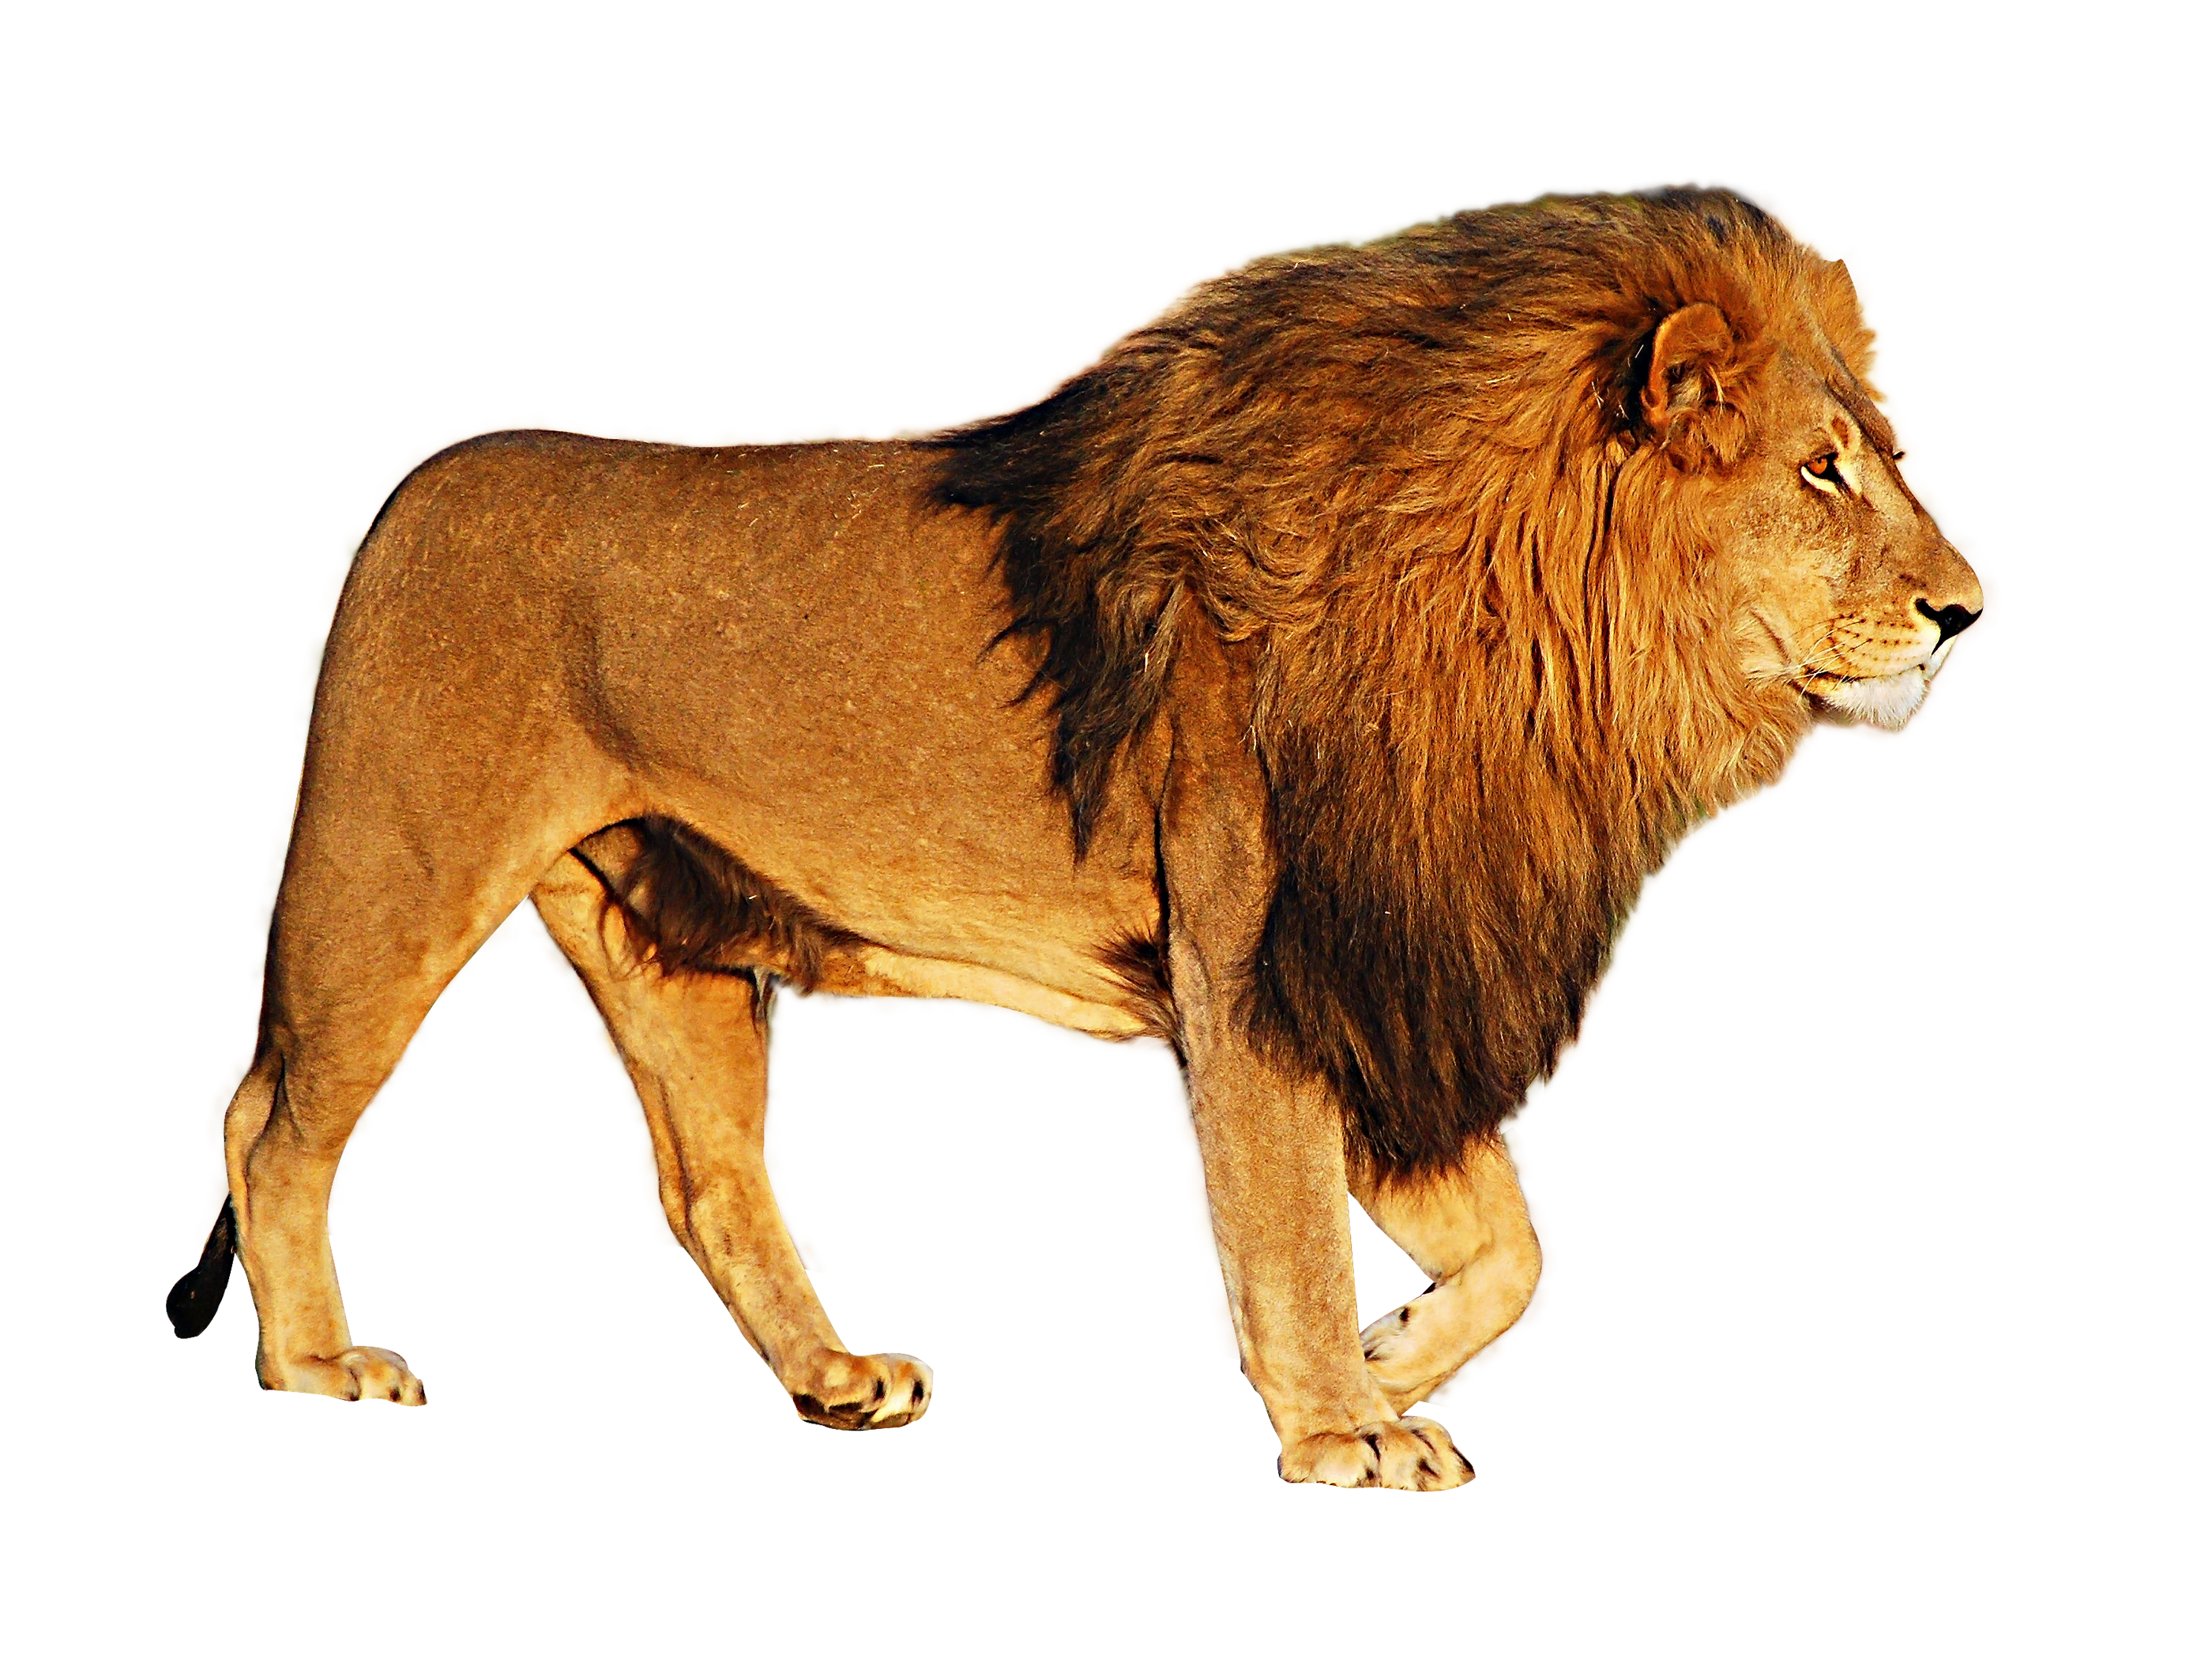 PlusPNG - Lion PNG